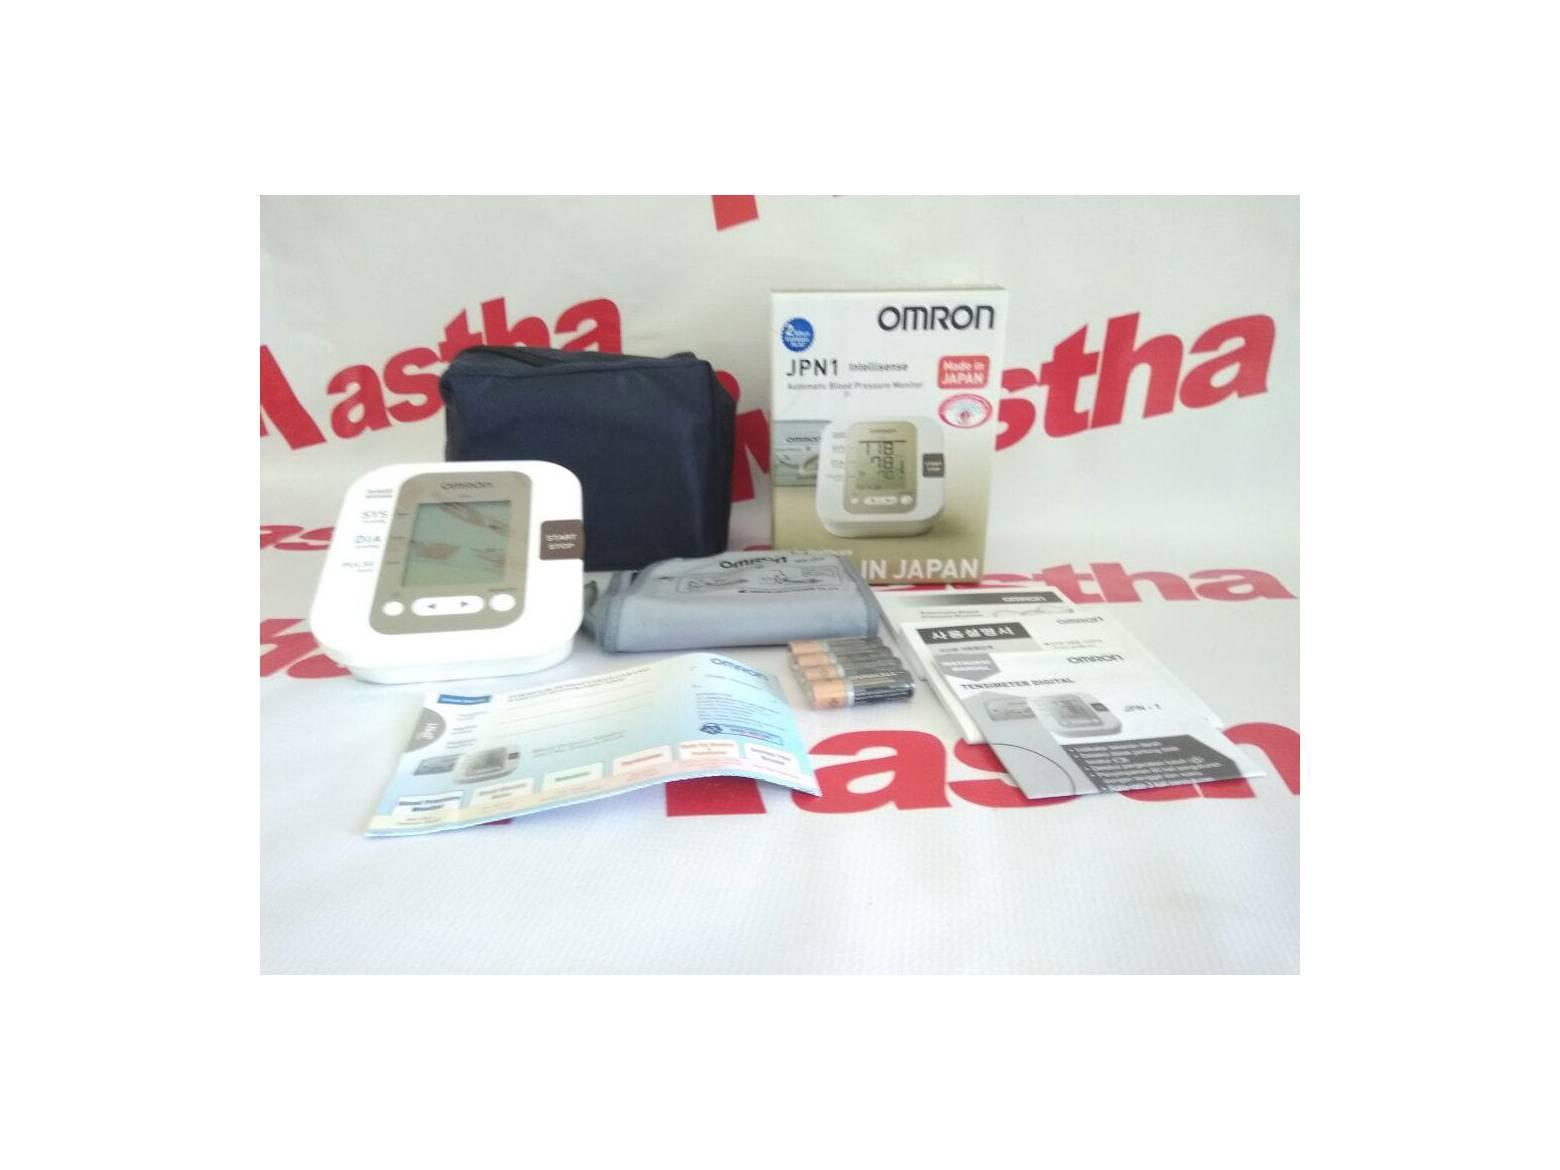 Buy Sell Cheapest Omron Jpn1 Intellissense Best Quality Product Tensimeter Blood Pressure Monitor Tensi Digital Elektrik Electric Made In Japan